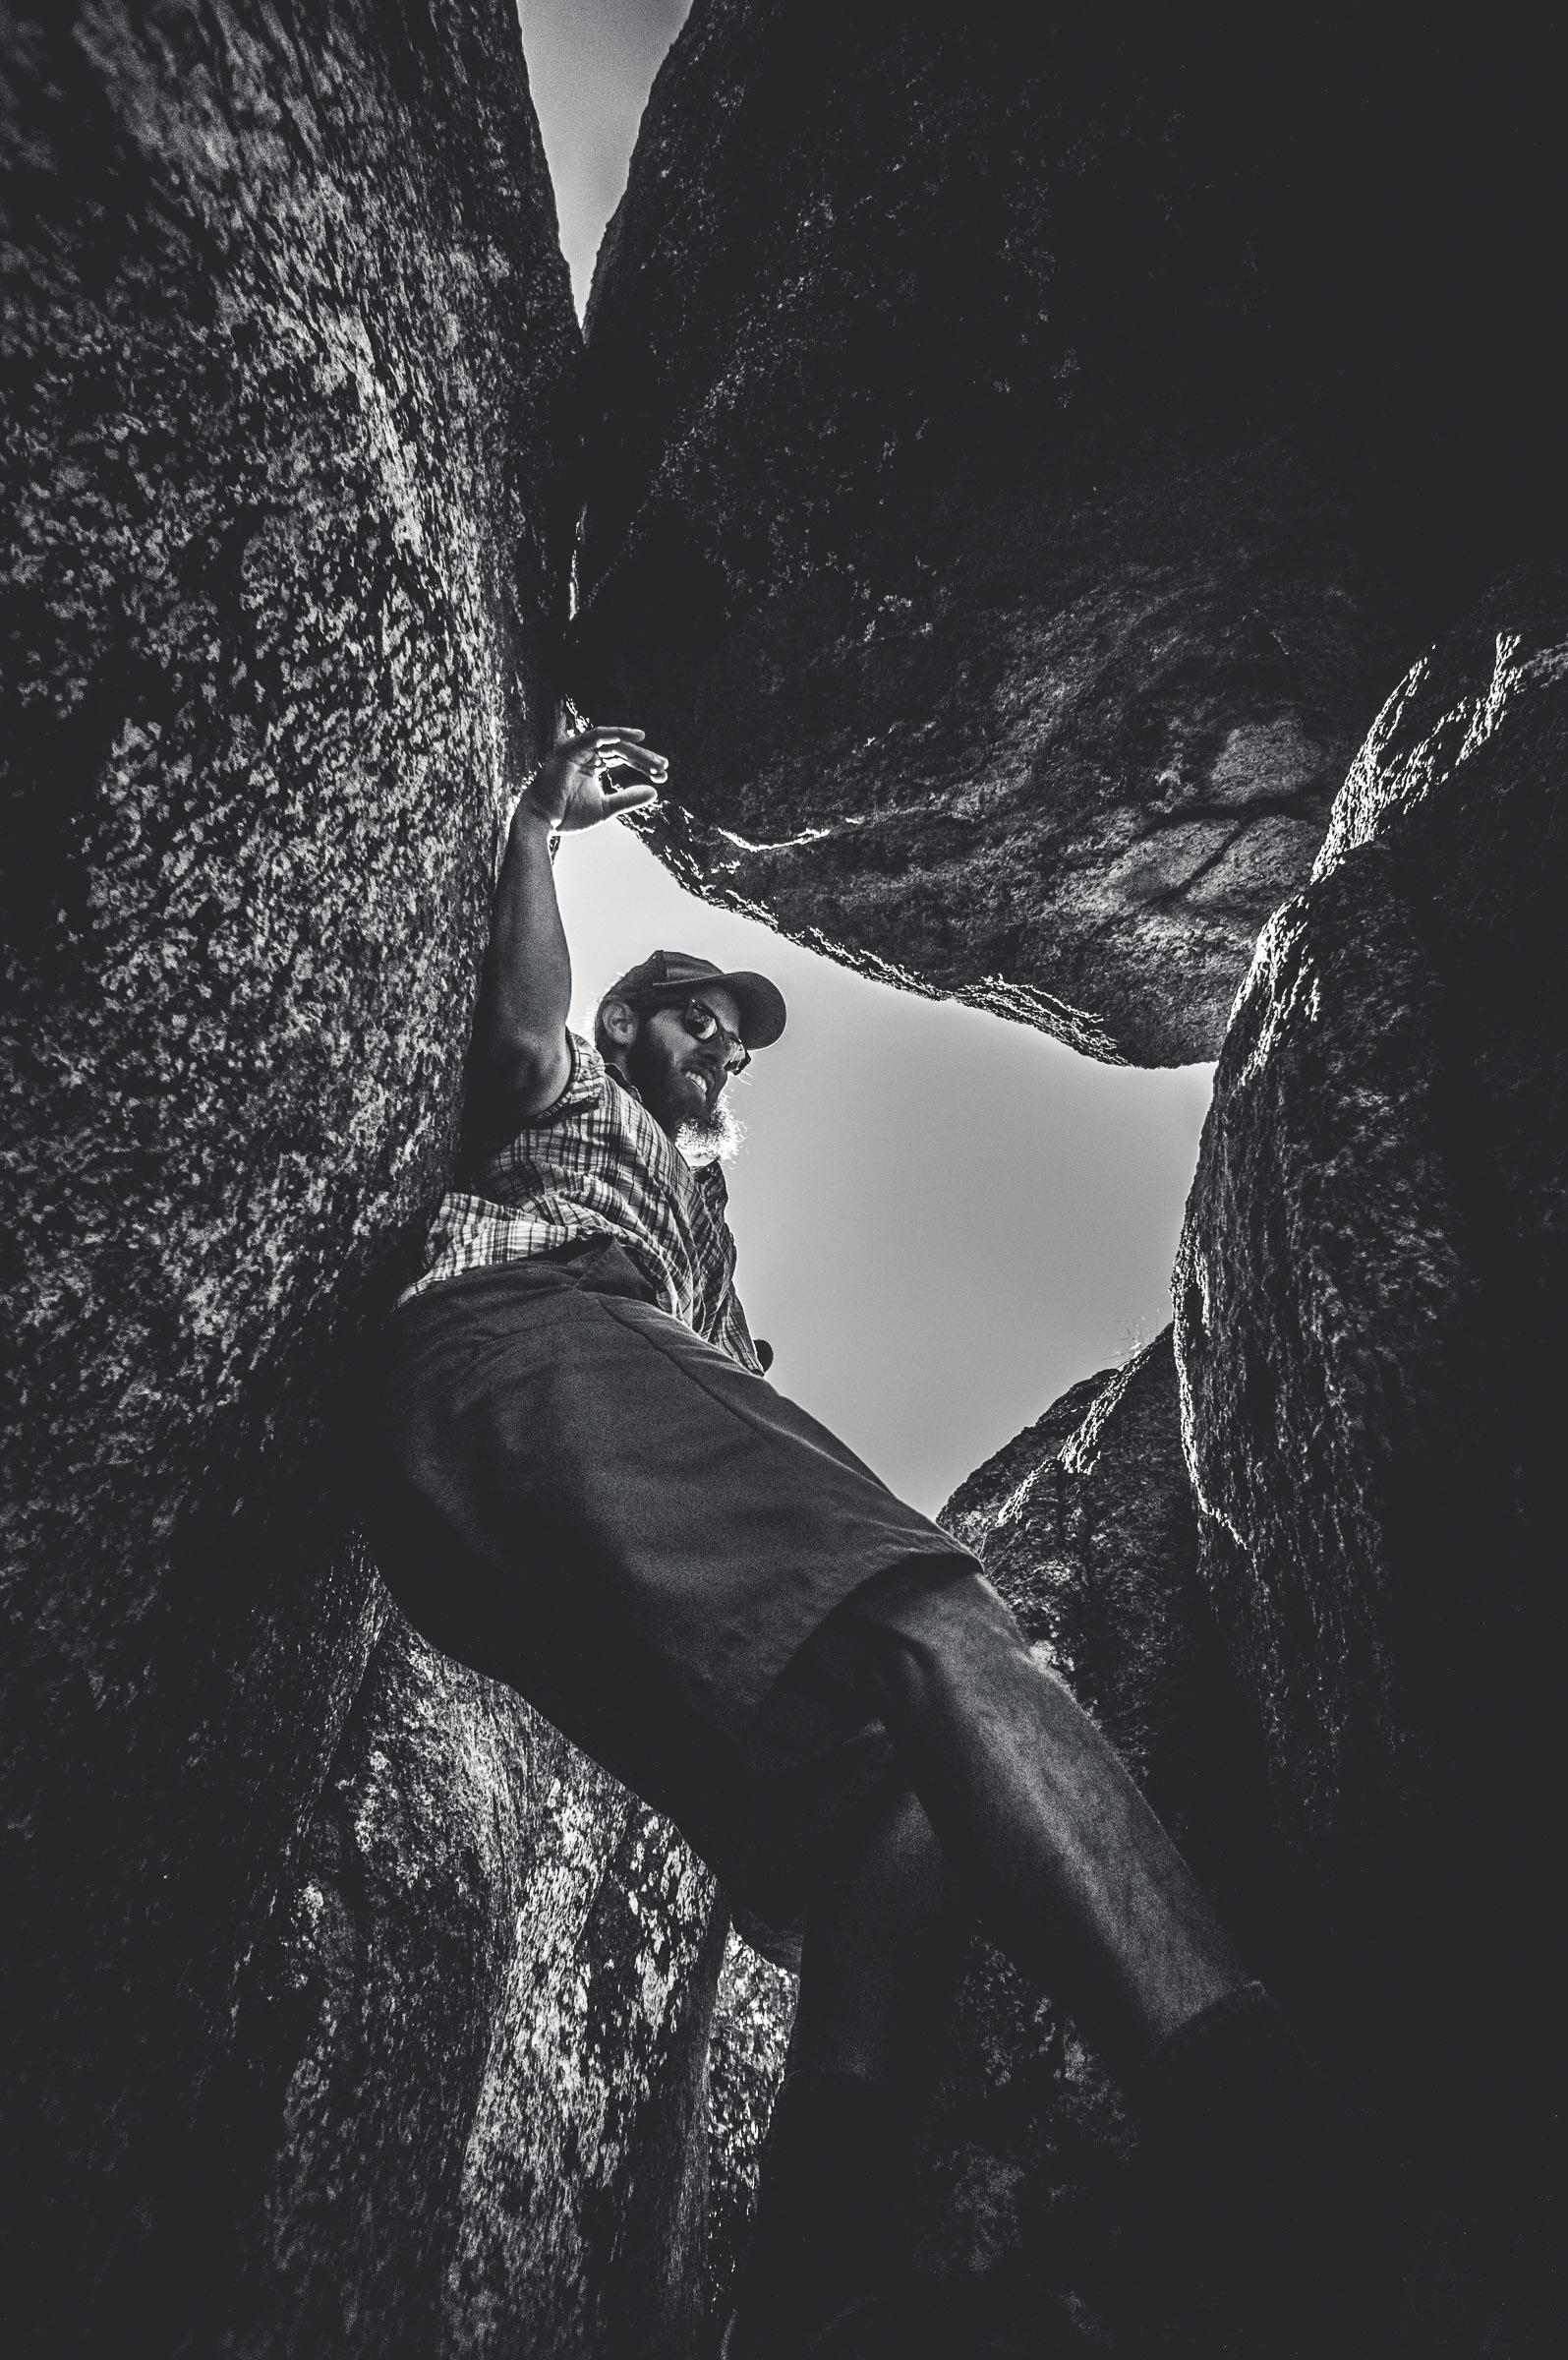 Spanish Cave 11-12-16 B&W (25 of 33).JPG